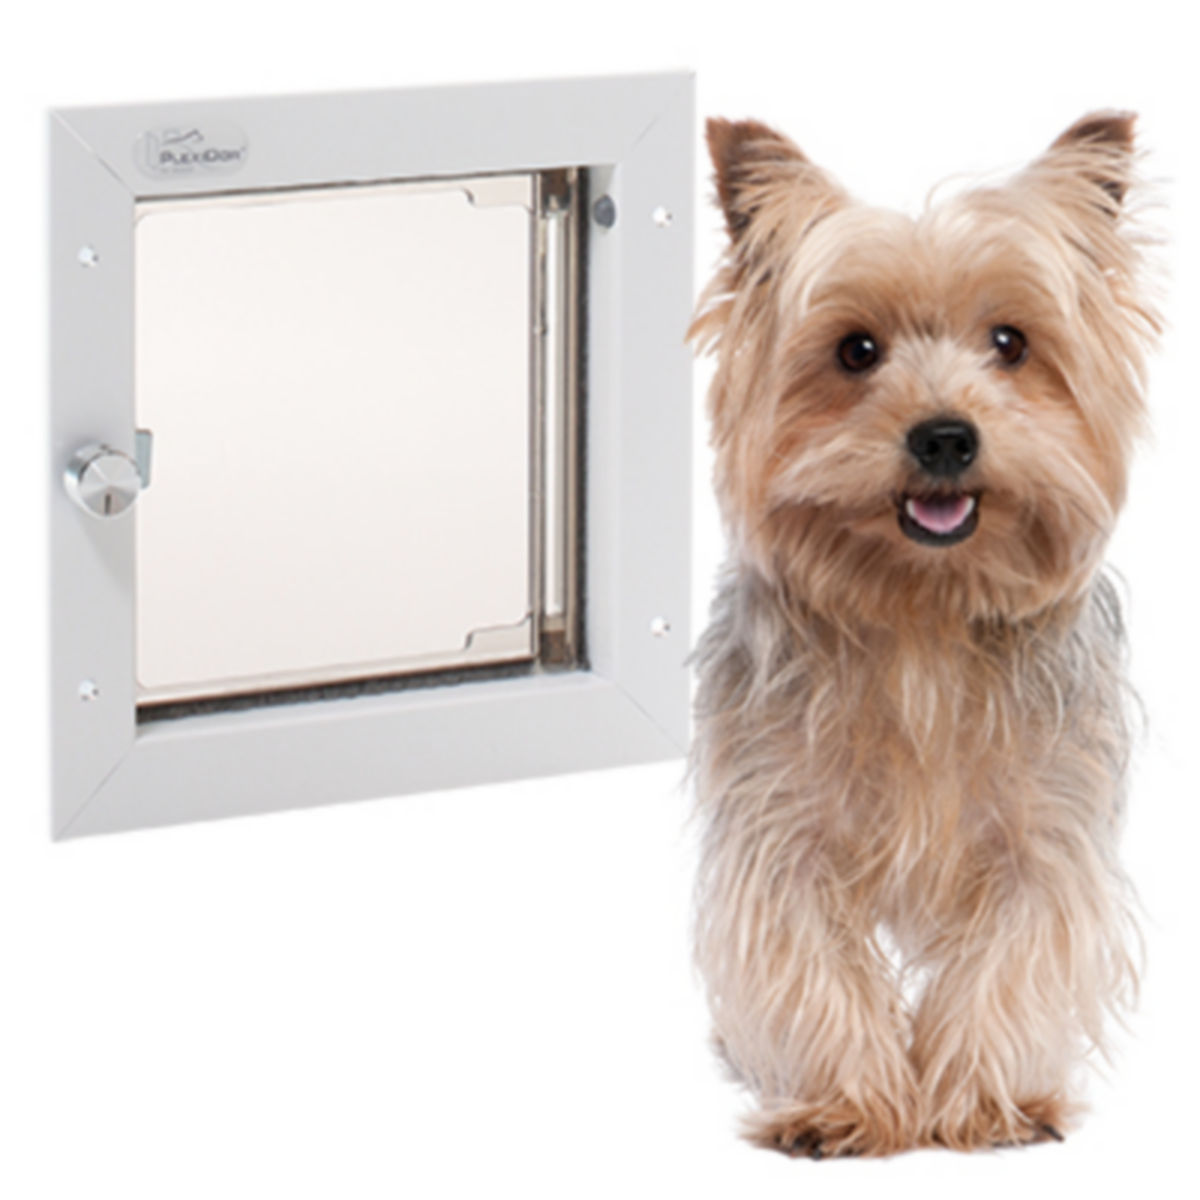 Dog Doors - image number 0